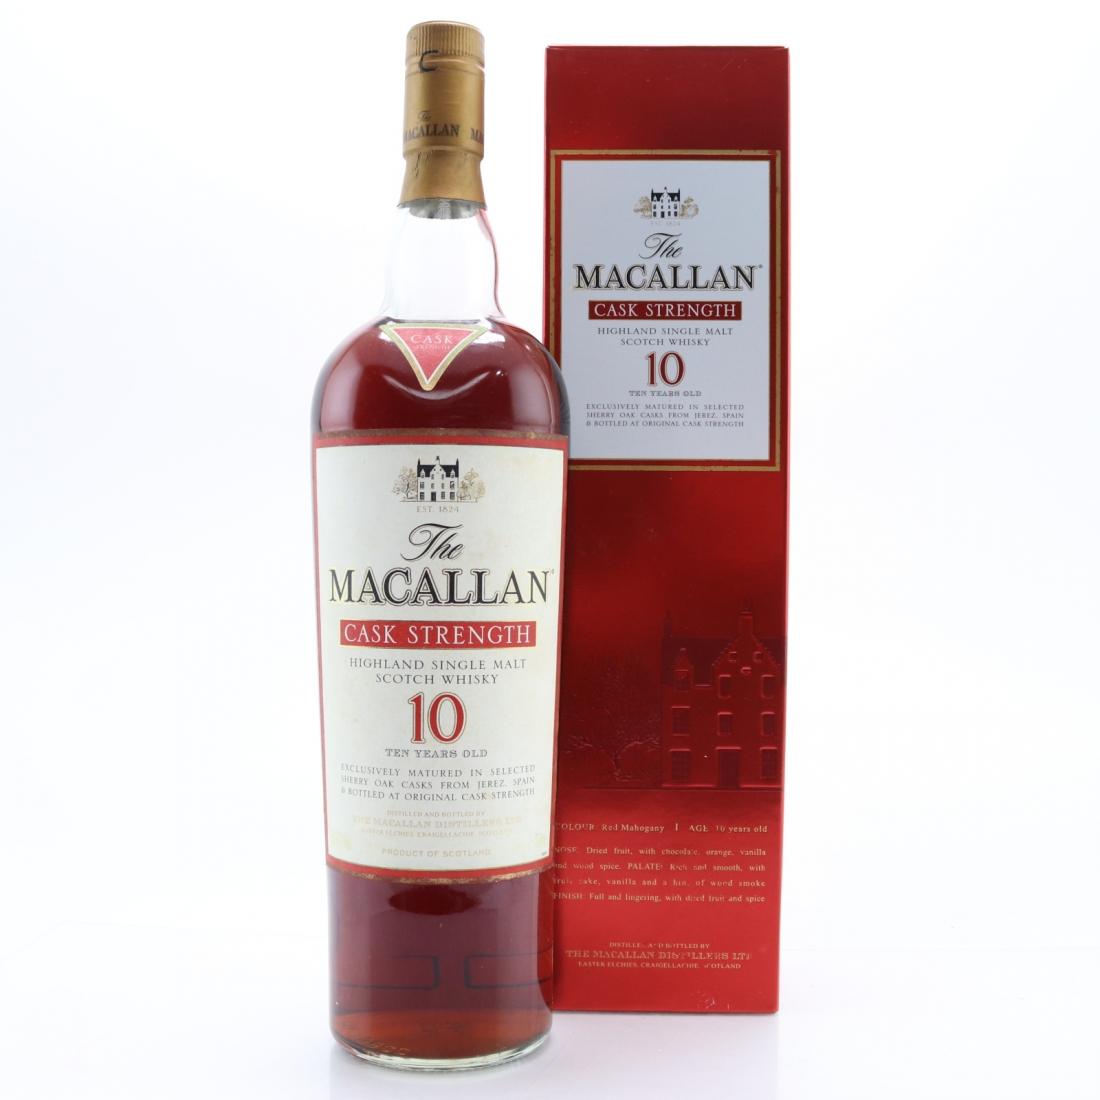 Macallan 10 Year Old Cask Strength 1 Litre / 58.1%